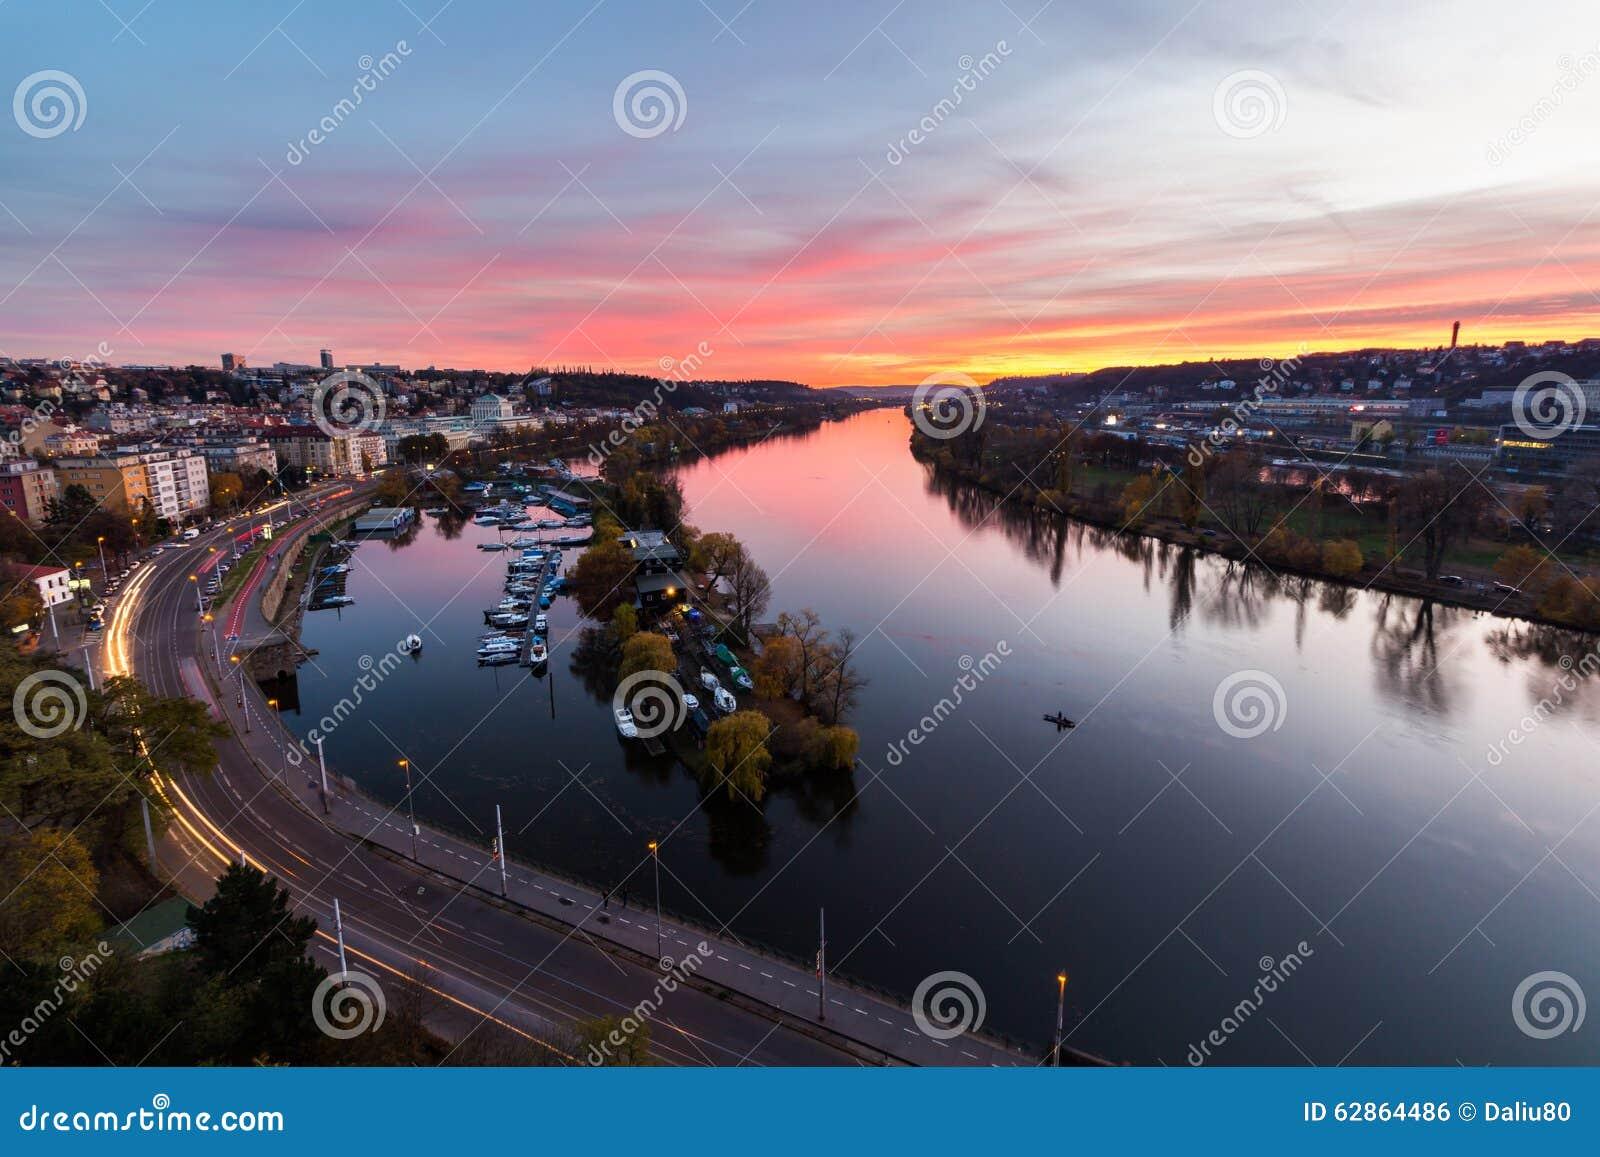 Evening Prague scene over Vltava/Moldau river in Prague taken from the top of Vysehrad castle, Czech Republic